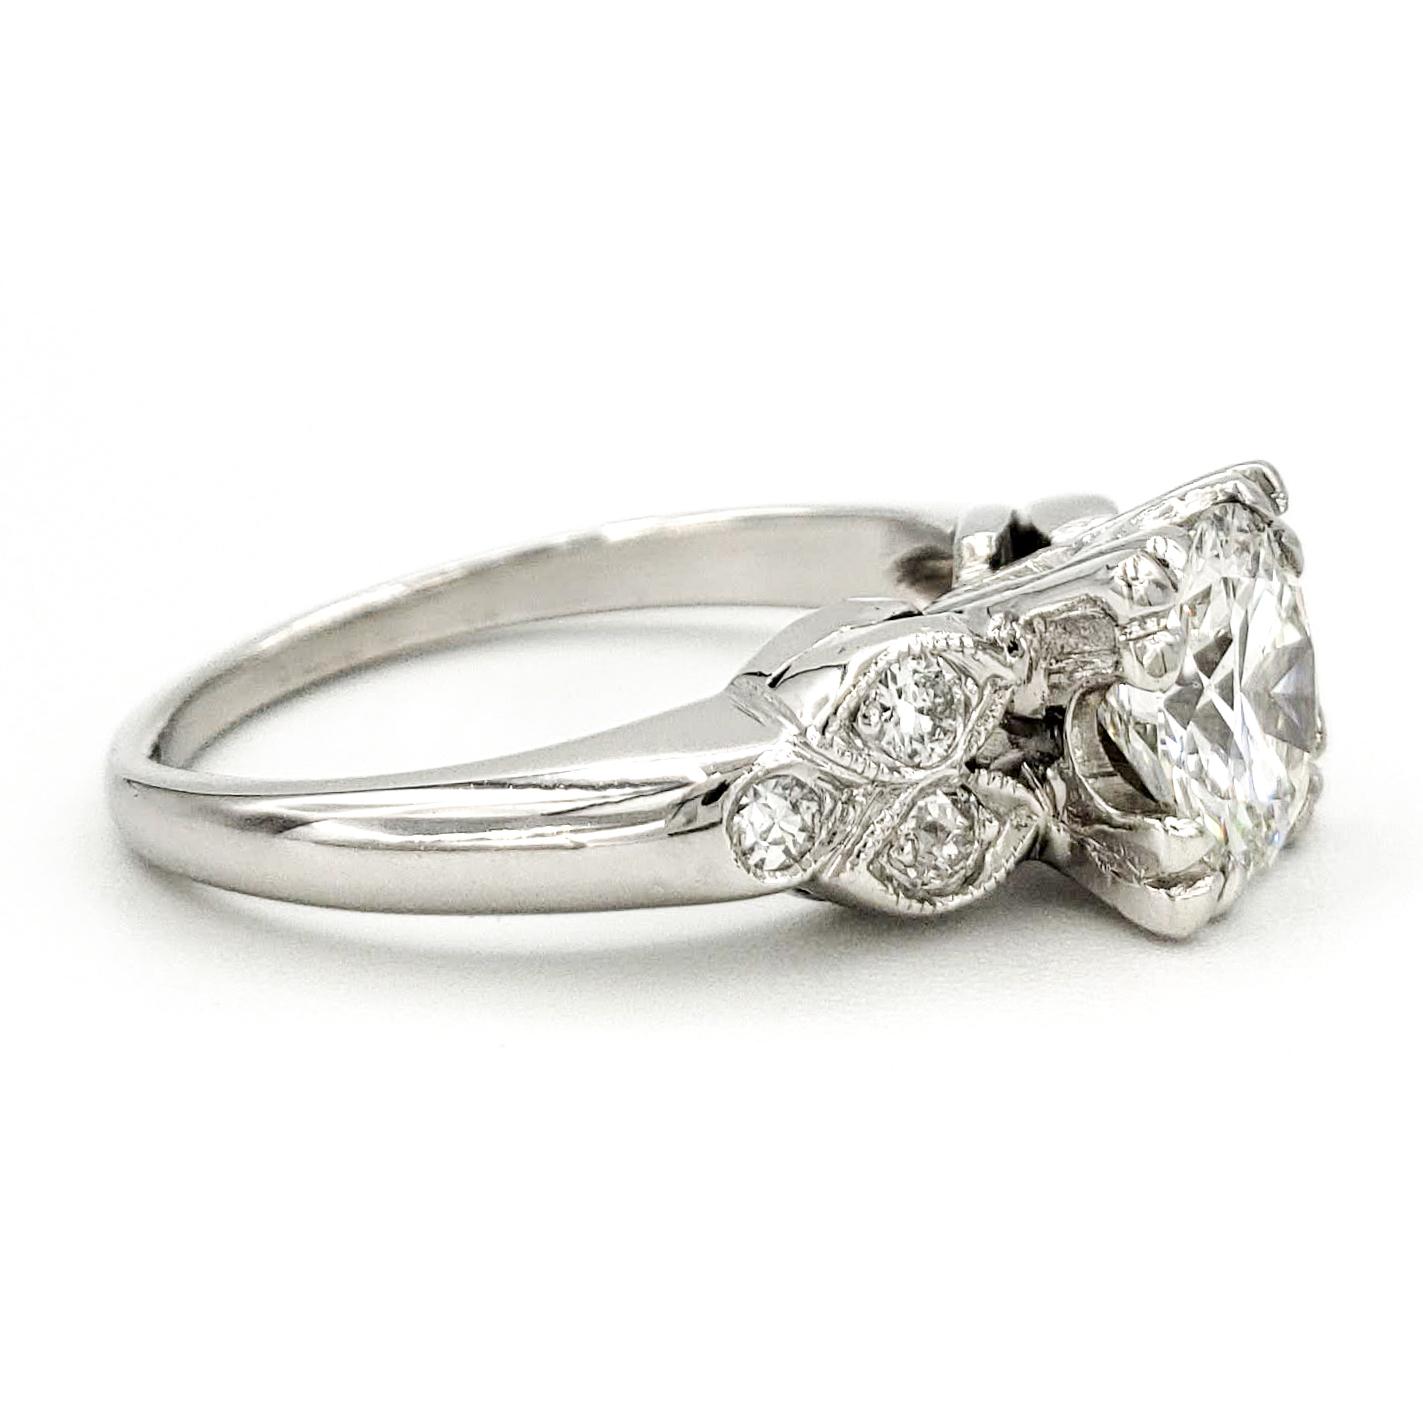 vintage-platinum-engagement-ring-with-1-06-carat-transitional-cut-diamond-egl-g-vs1